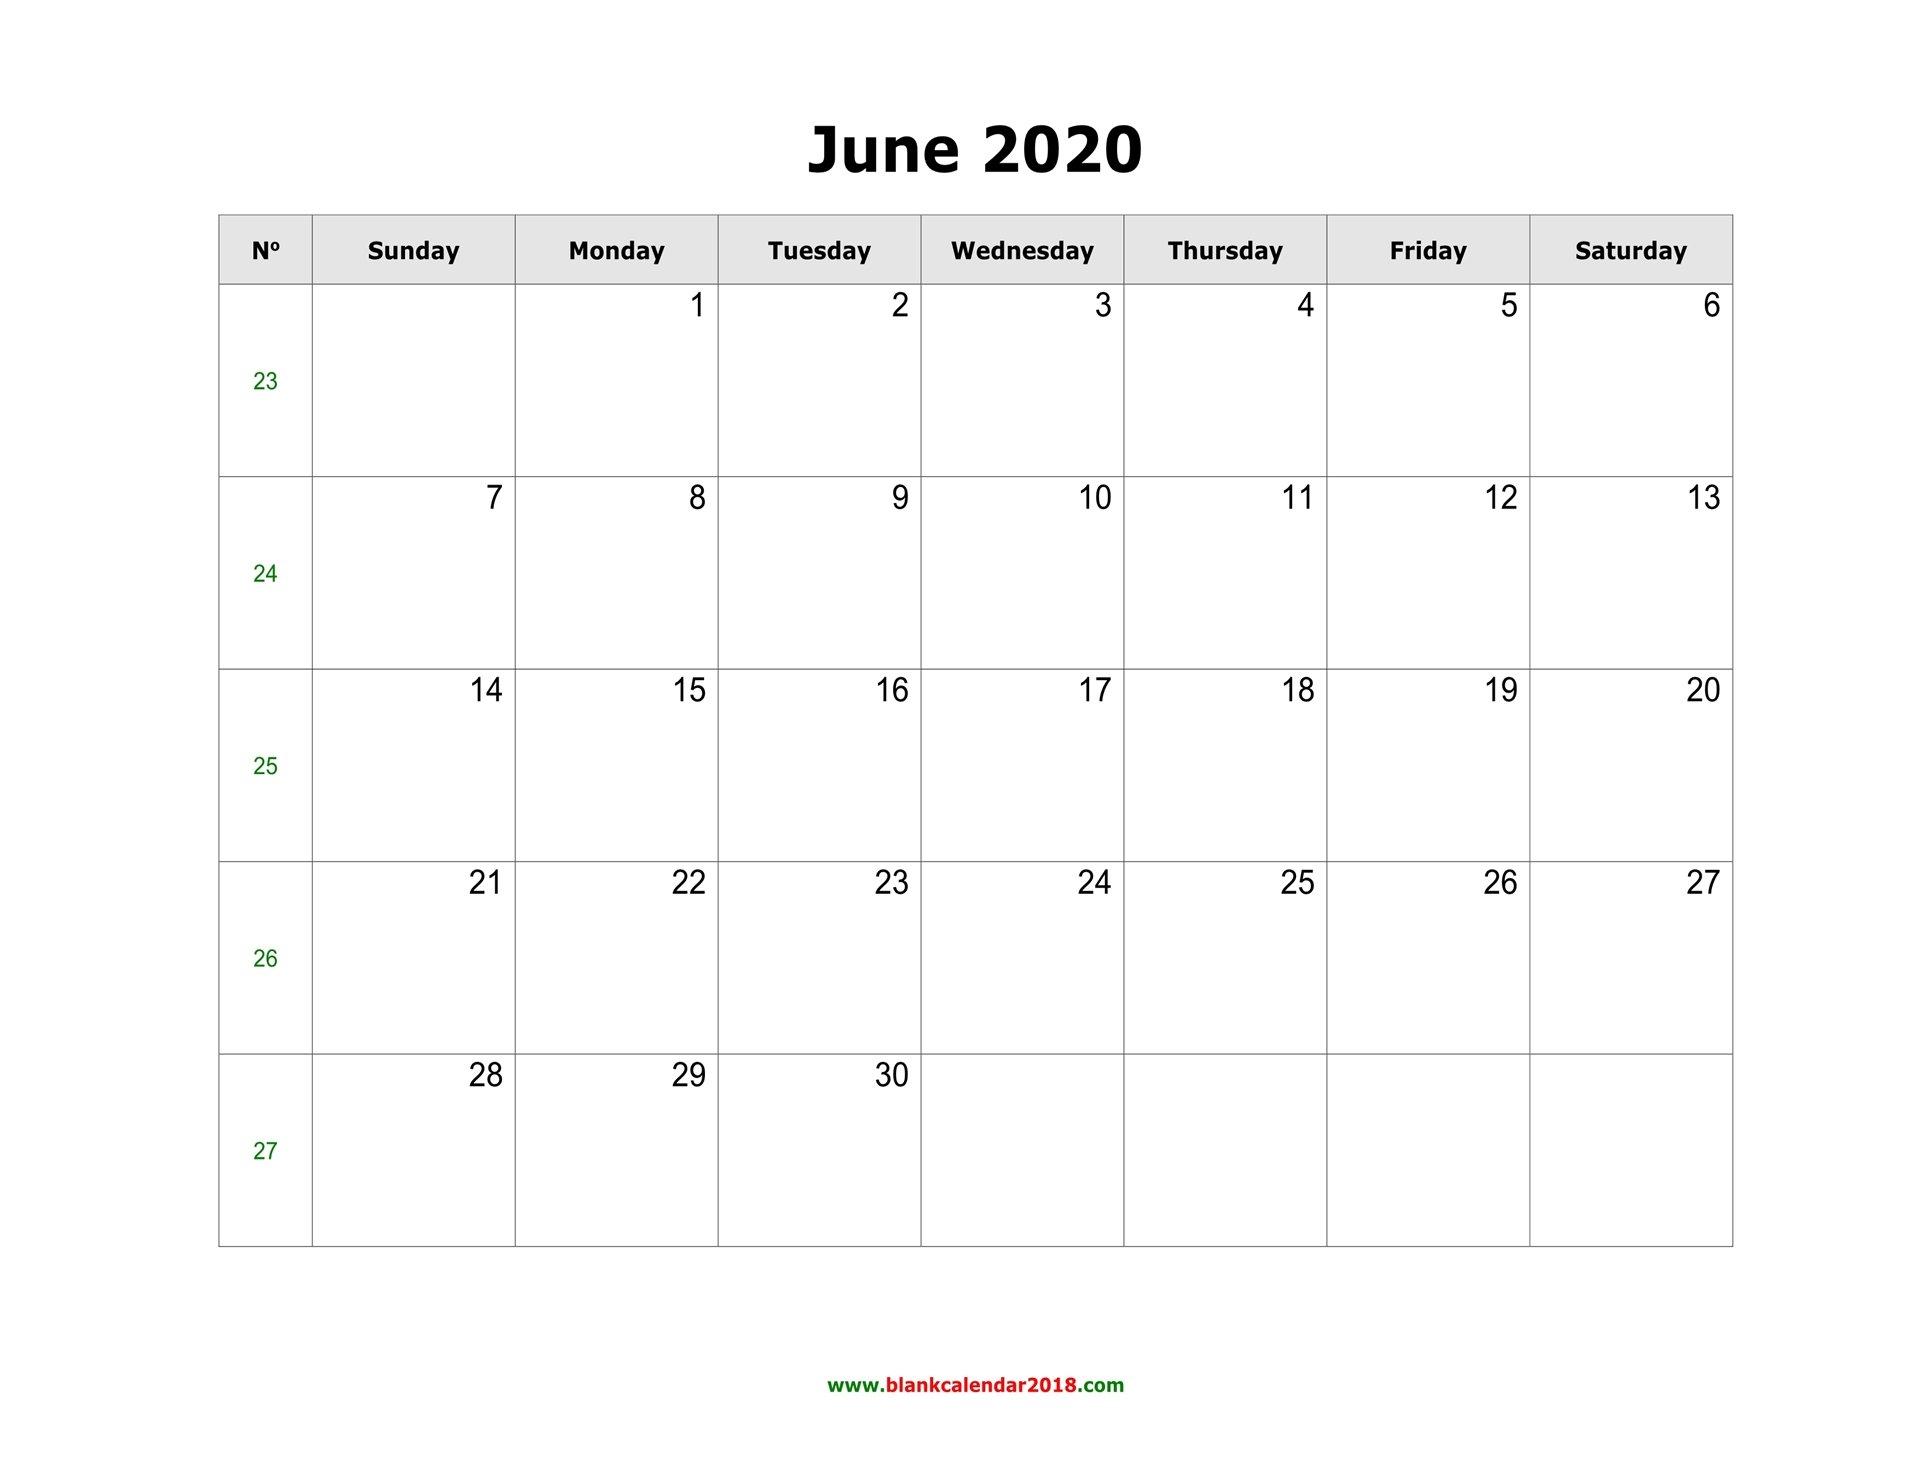 Blank Calendar For June 2020 June Monday To Friday Downloadable Calendar